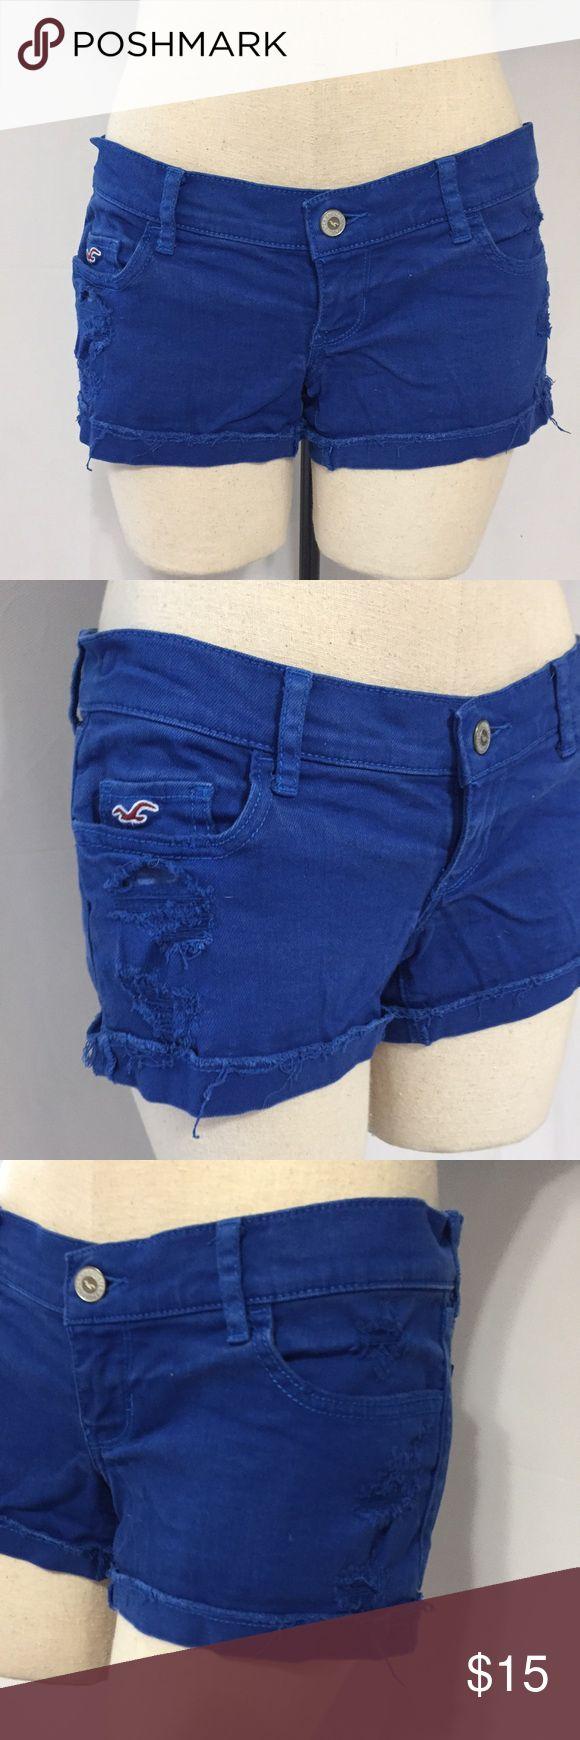 Hollister denim jean shorts sz 0 Cobalt Blue Guc, naturally distressed Hollister jeans, color is cobalt blue, size 0 w24. Hollister Shorts Jean Shorts